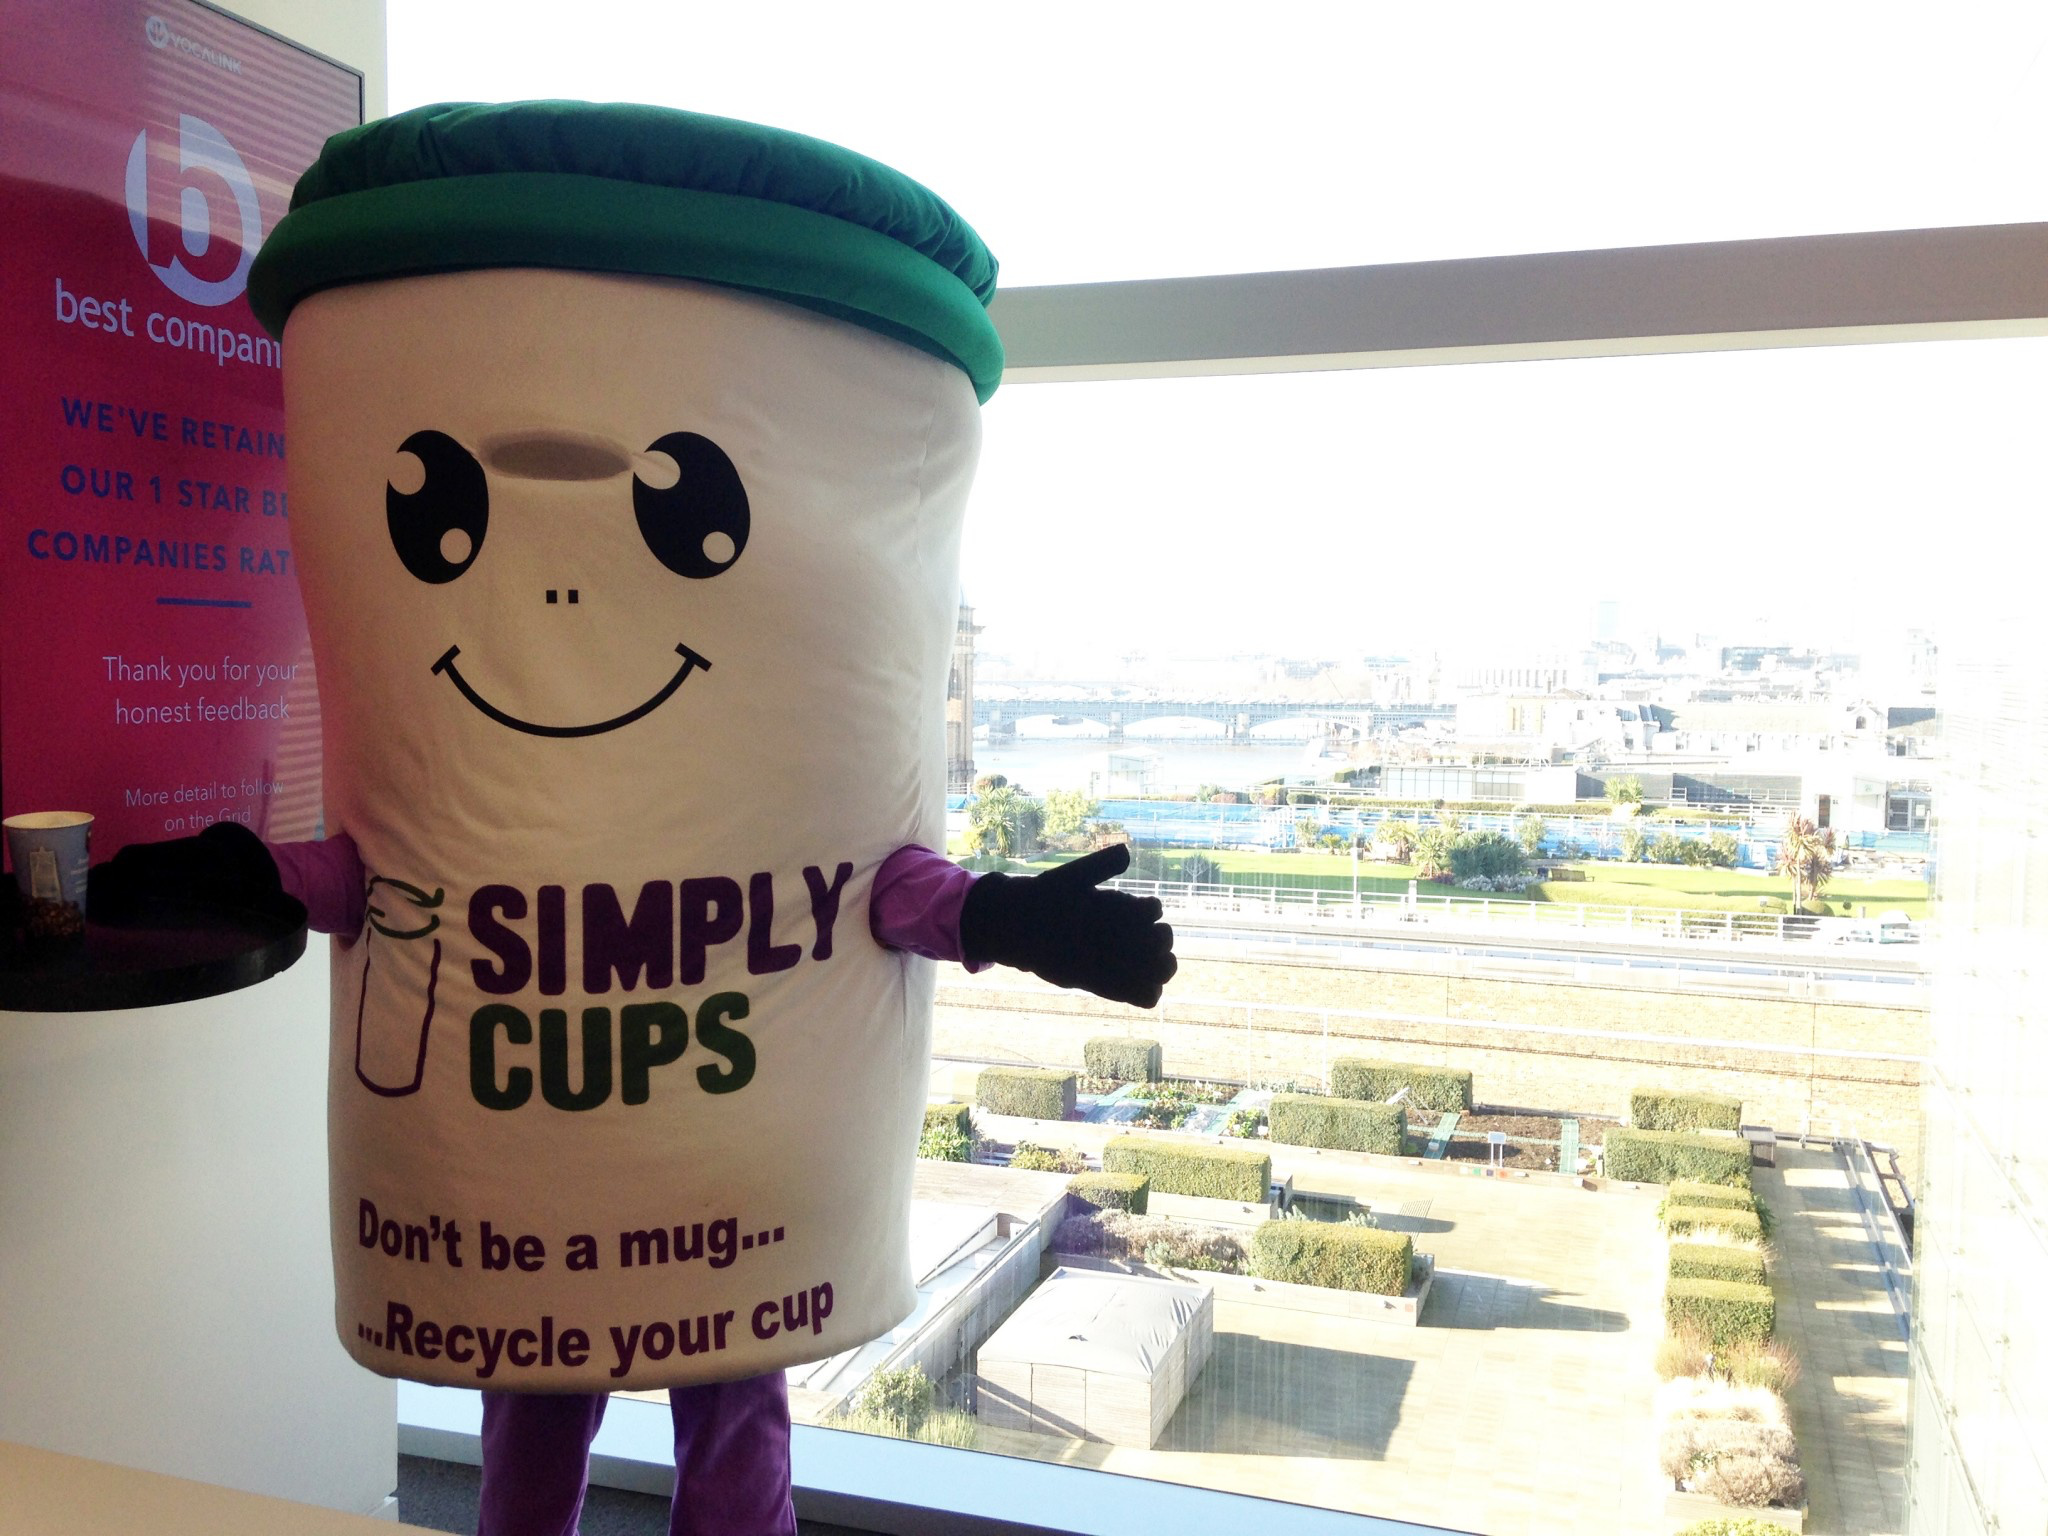 Simply Cup's Cupbert maskot